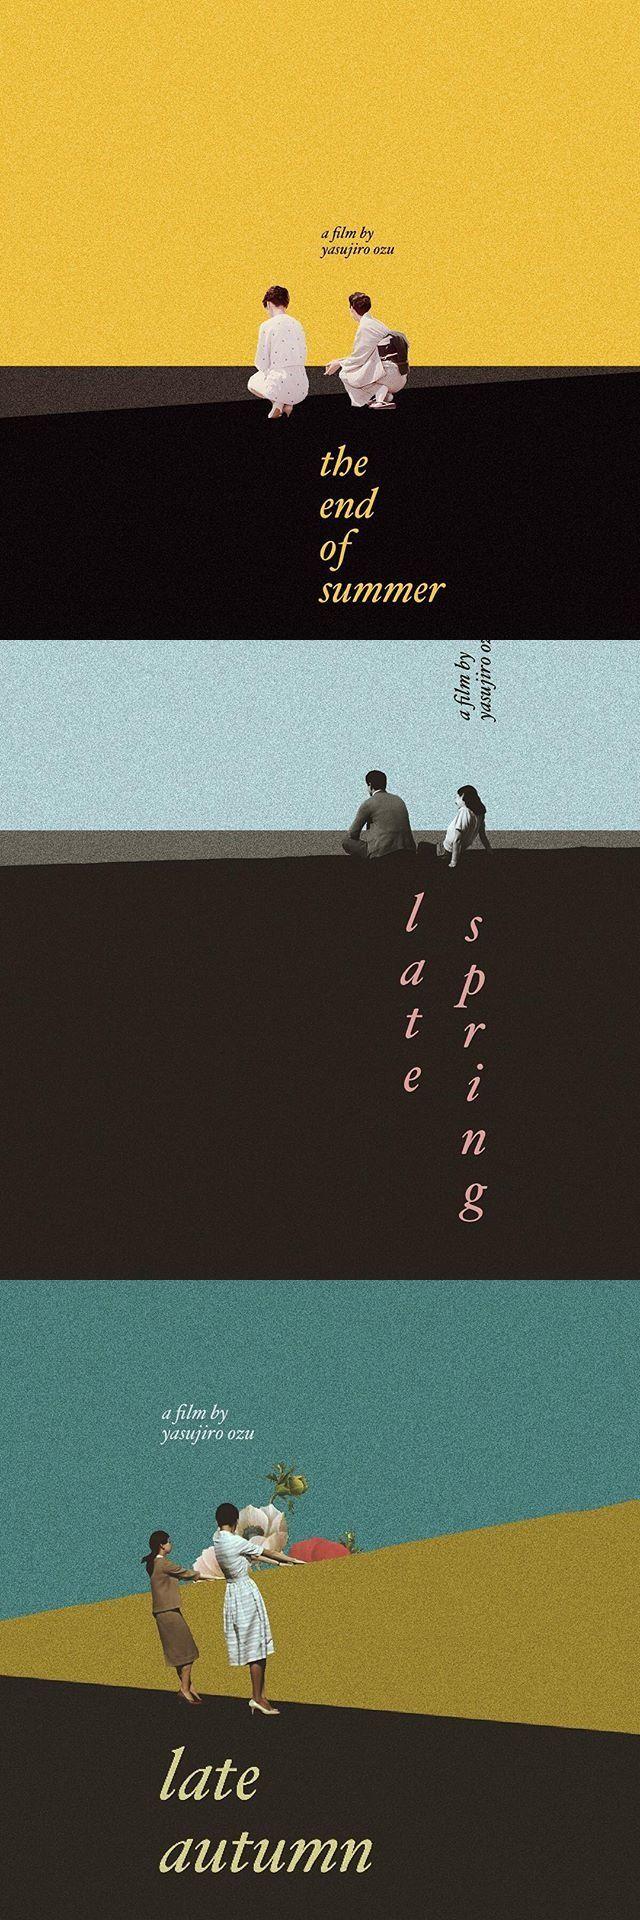 Unofficial Posters of Yasujiro Ozu's films, designed by Fajar P. Domingo